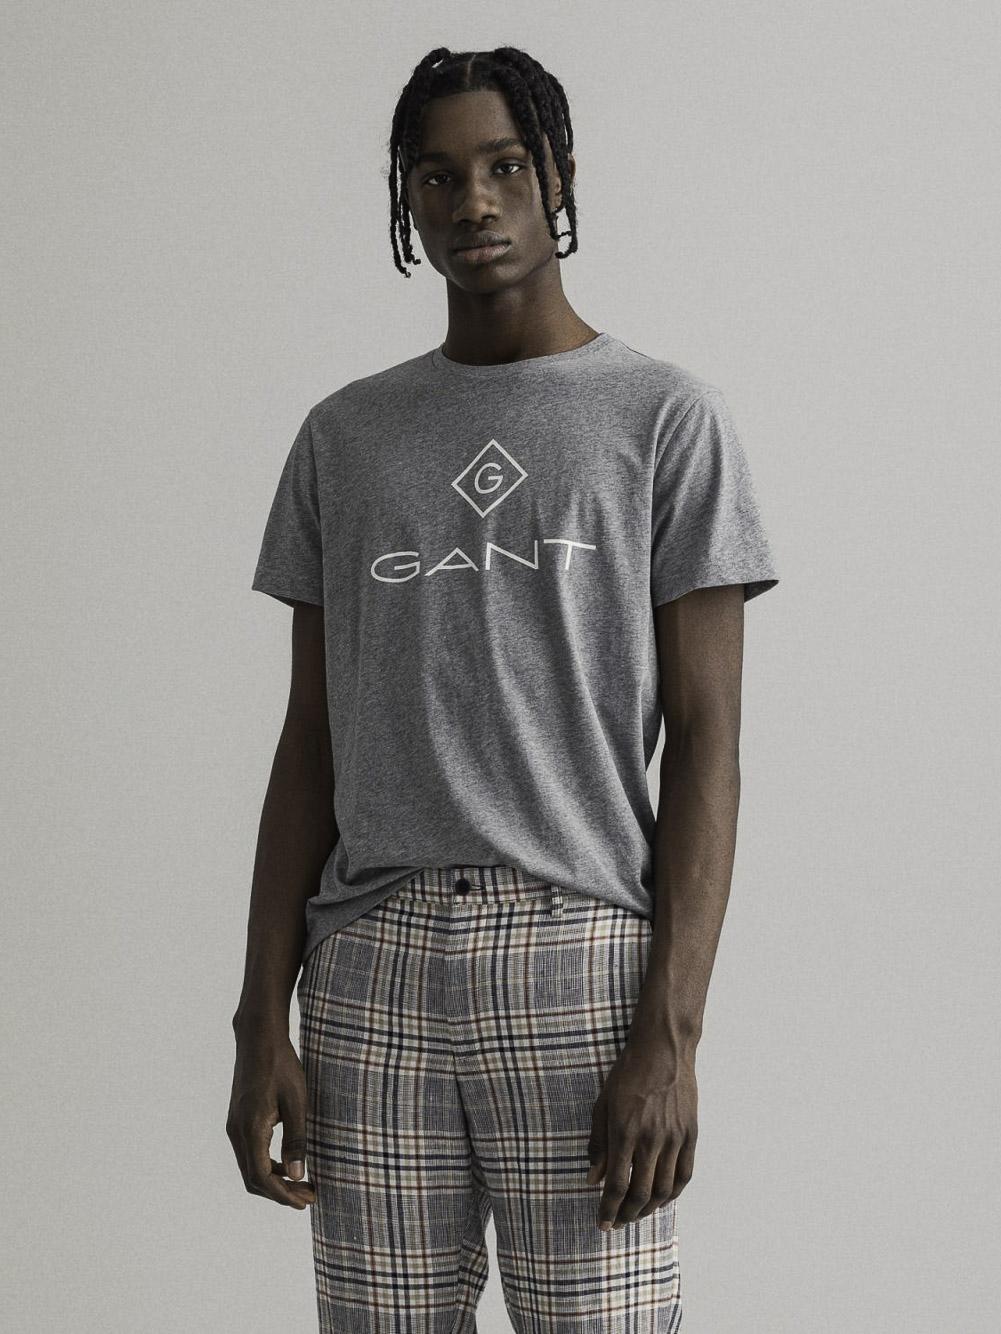 GANT Μπλούζα t-shirt 3G2023000-93 ΓΚΡΙ